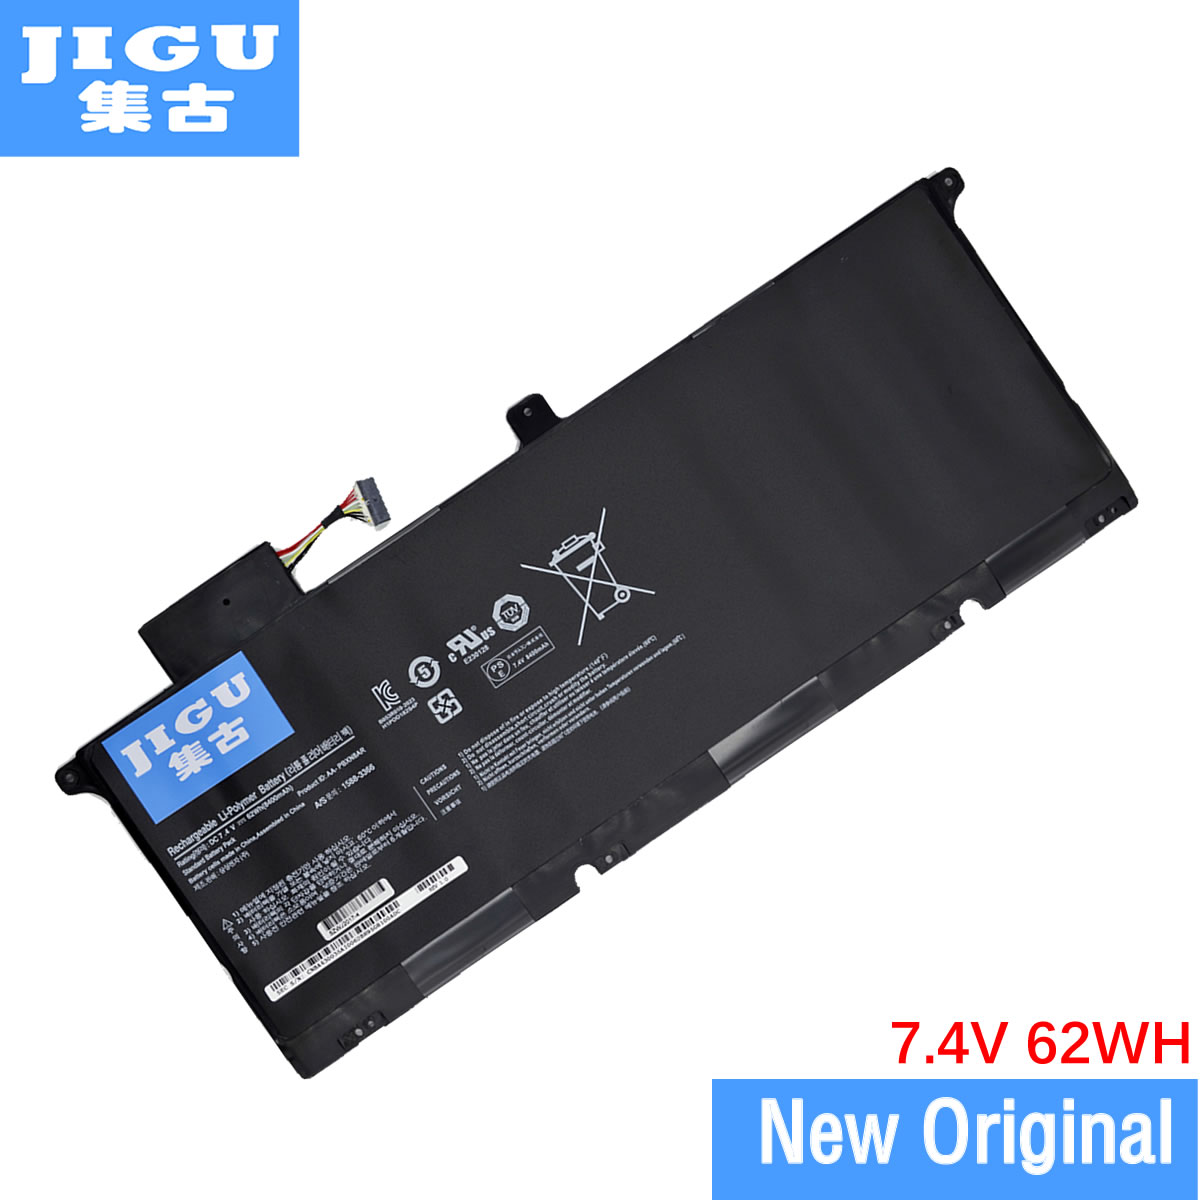 JIGU 8400mAh AA-PBXN8AR Replacement Laptop Battery For Samsung 900X4 900X46 900X4B-A01DE 900X4B-A01FR 900X4B-A03 NP900X4 aa pbxn8ar battery for samsung 900x4b np900x4b np900x4c laptop